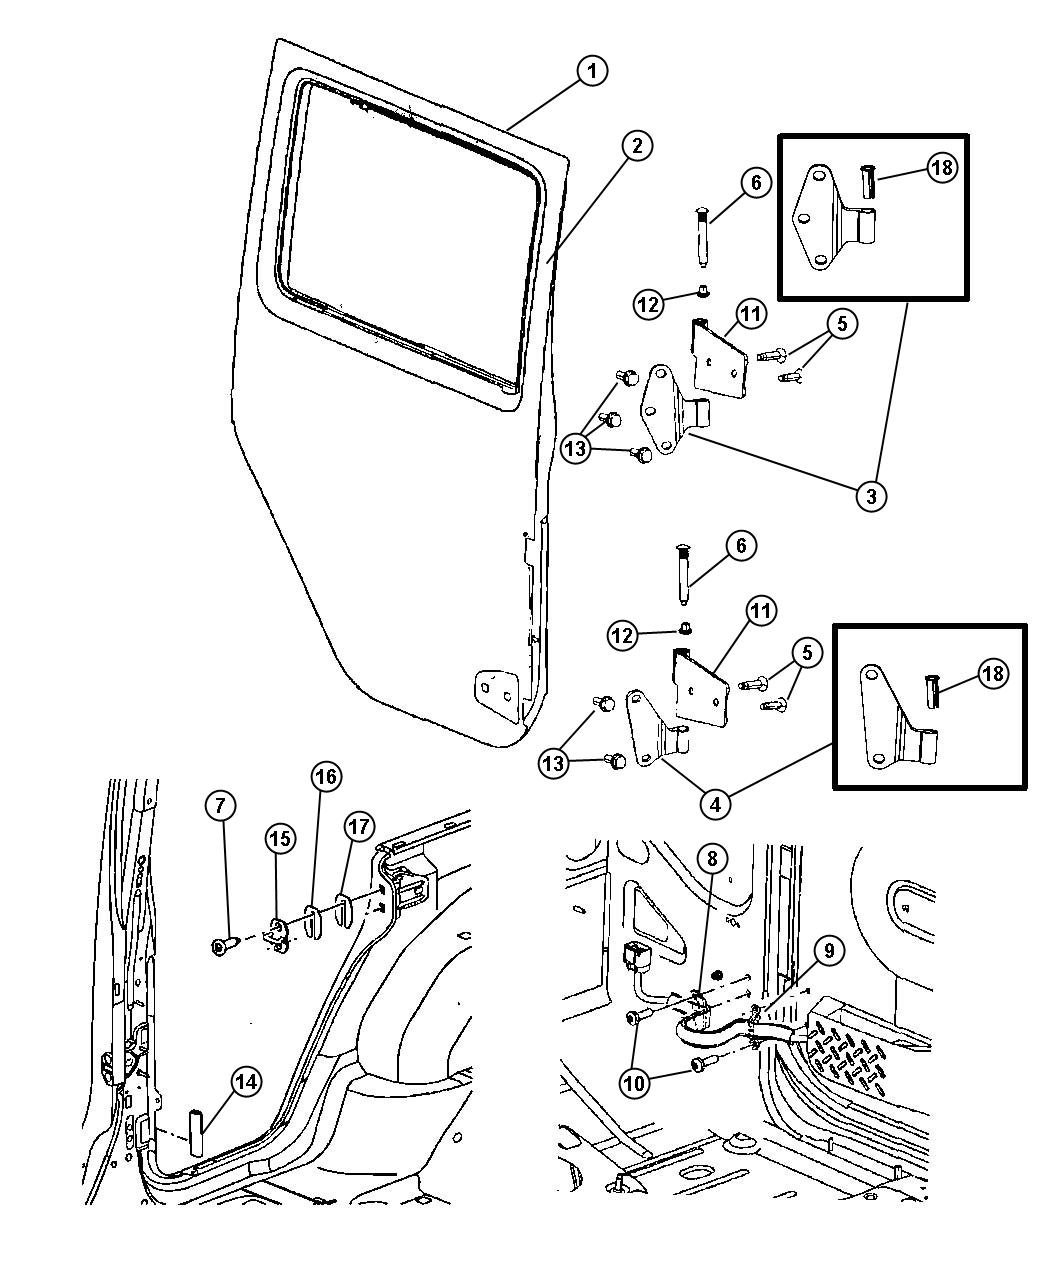 2013 Jeep Wrangler Molding. Check strap. Door, rear, full